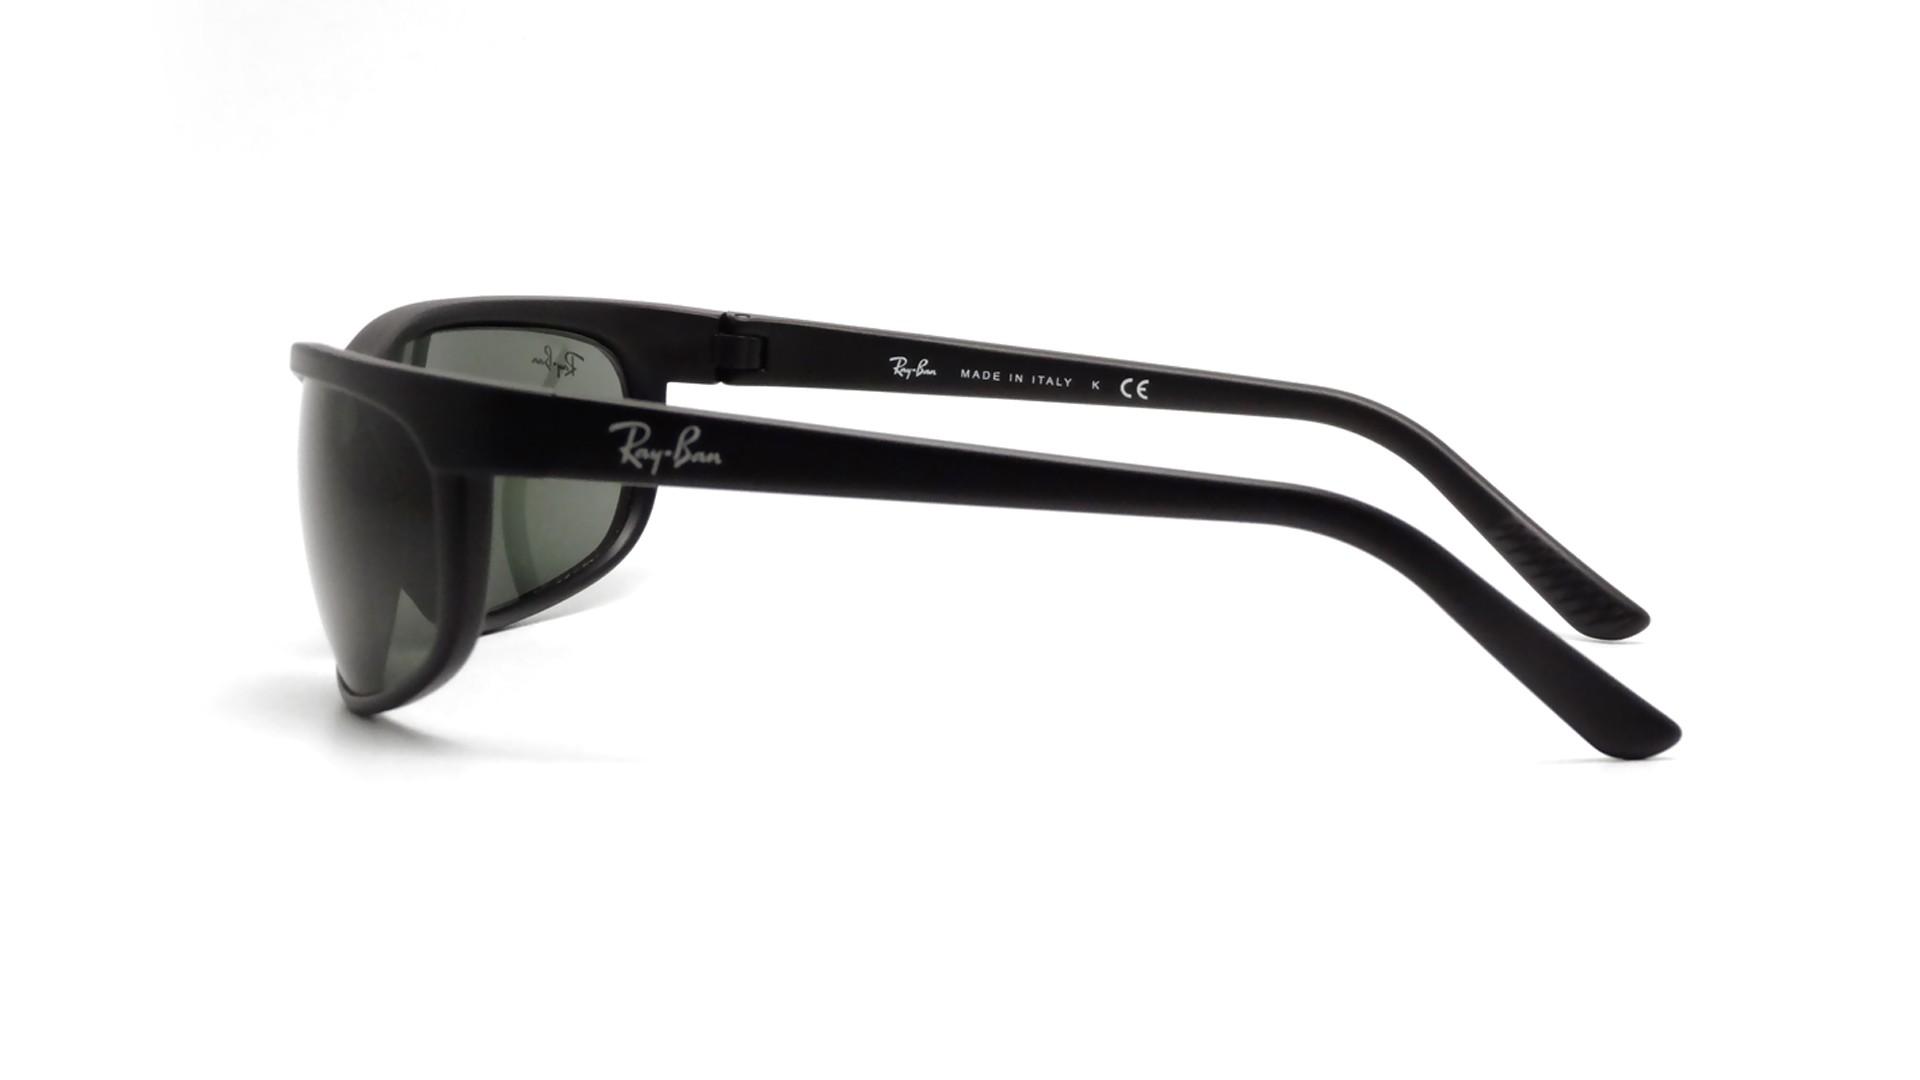 7219e3689f38 Sunglasses Ray-Ban Predator 2 Black RB07 W1847 6-19 Large